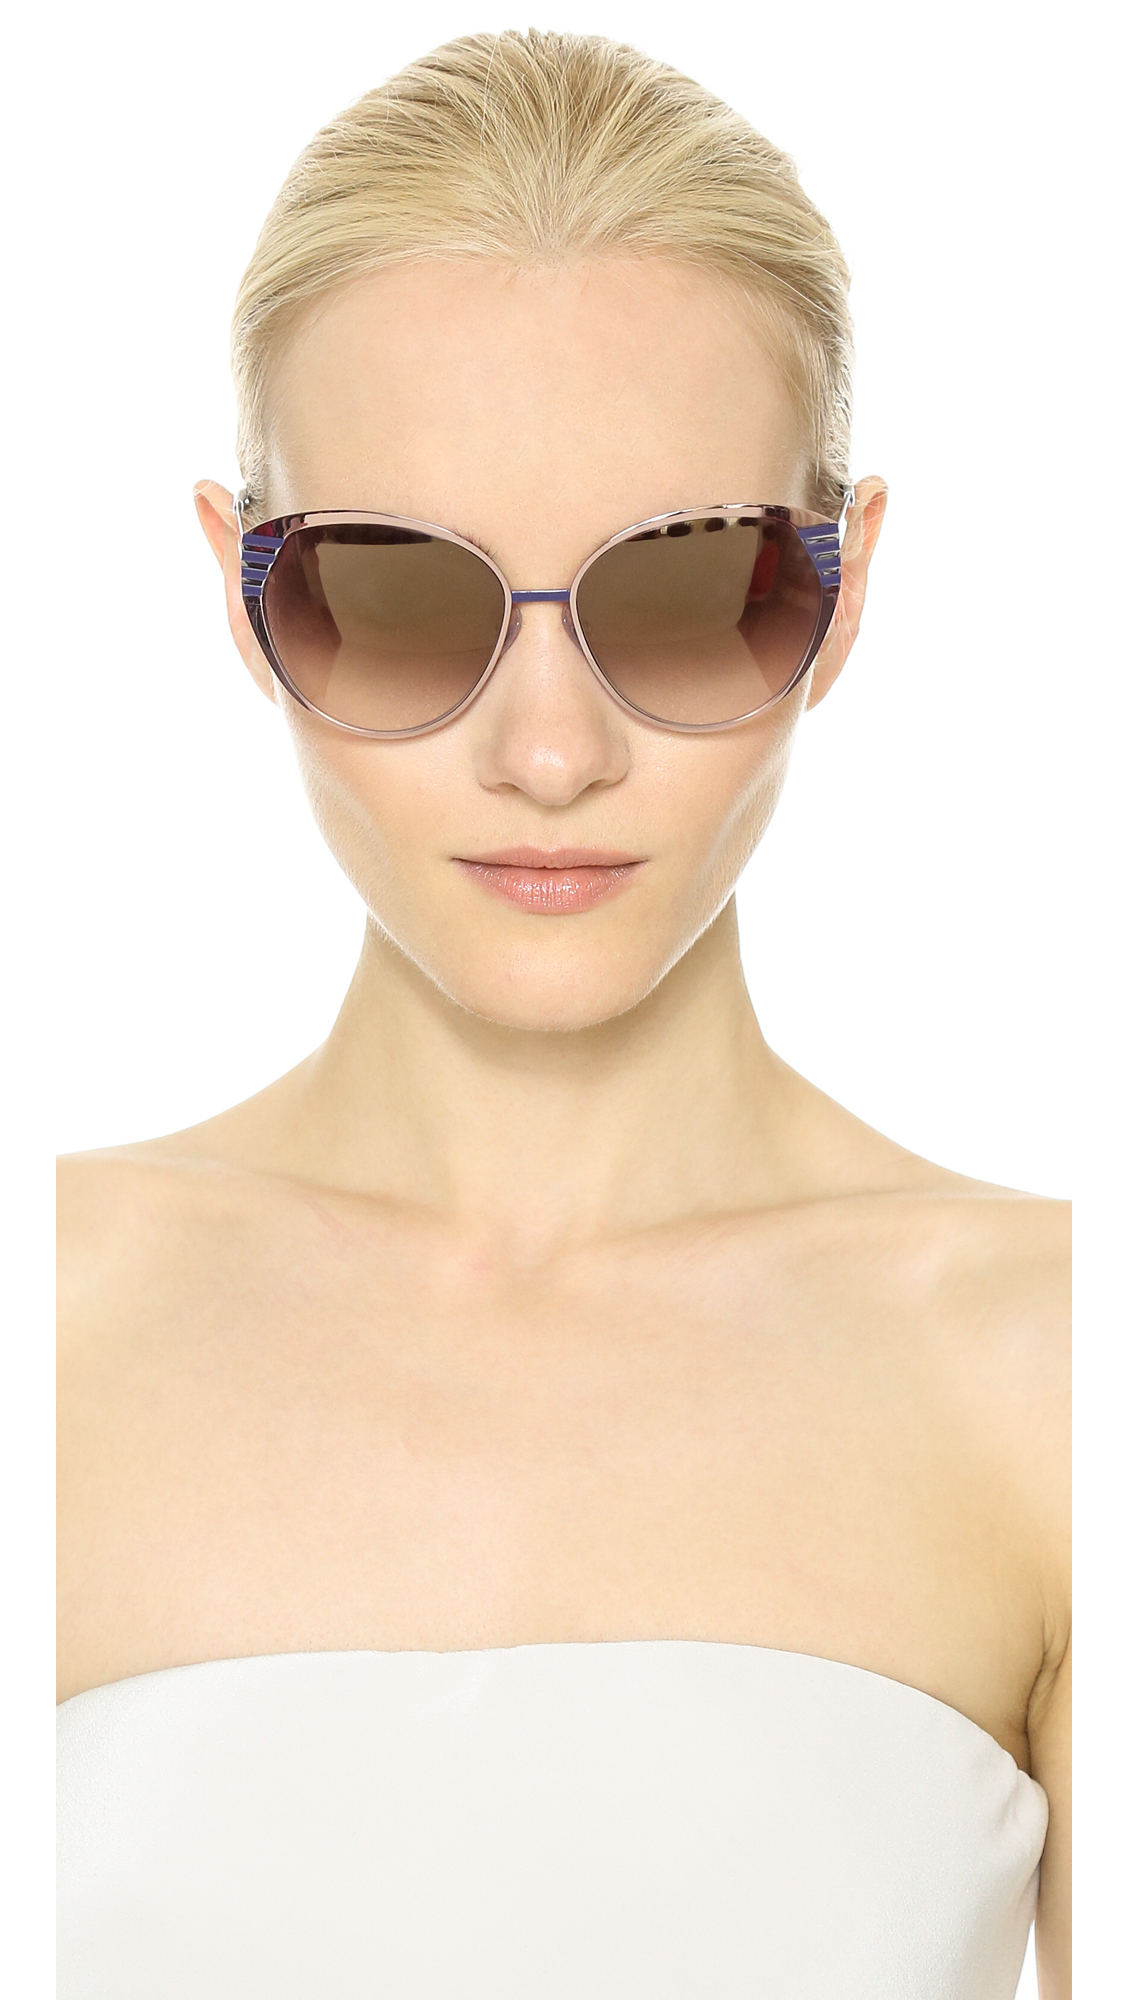 d08b0265f109 Fendi Mirrored Cat Eye Sunglasses - Light Peach Brown Mirror in Pink ...